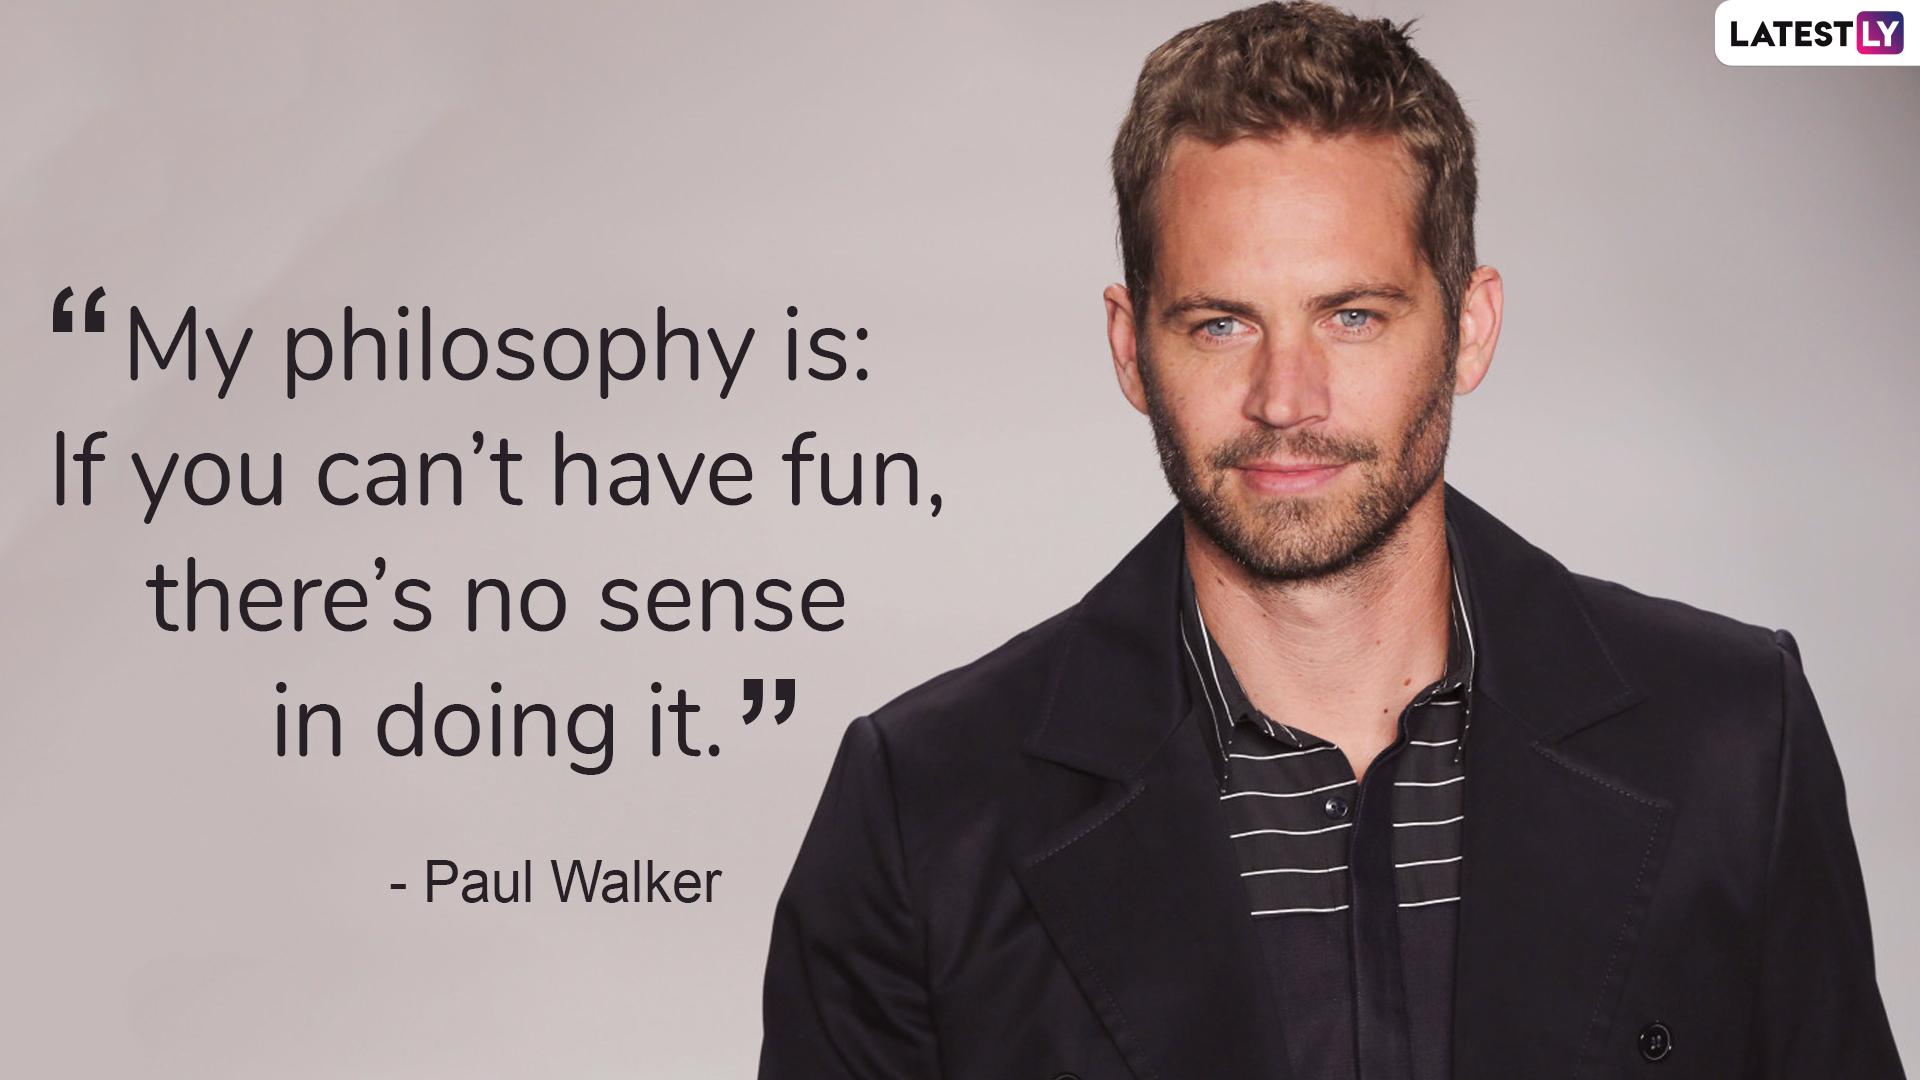 Paul Walker on living life happily.